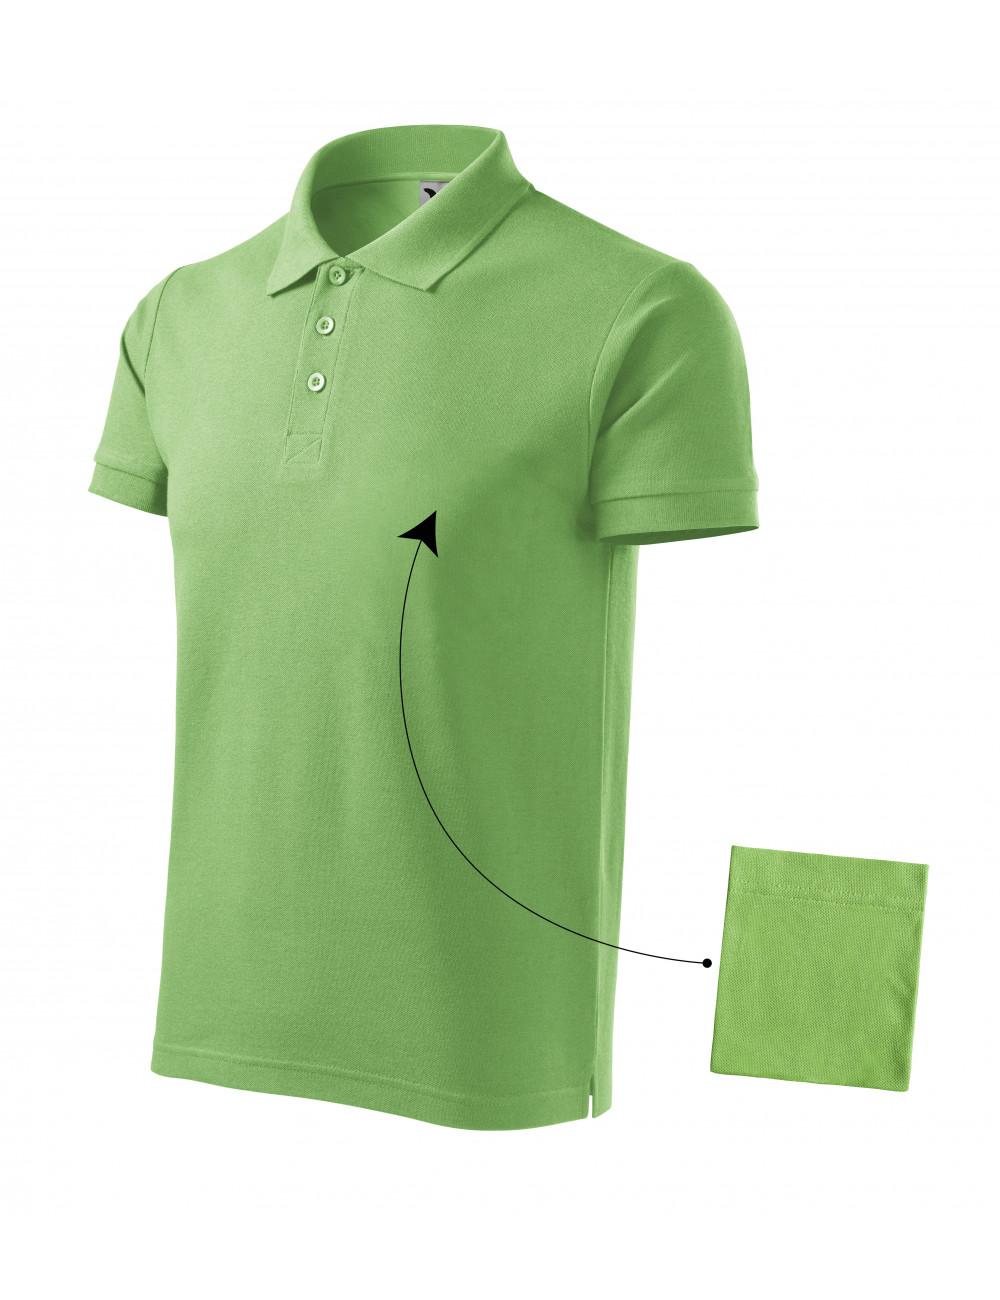 Adler MALFINI Koszulka polo męska Cotton 212 groszkowy